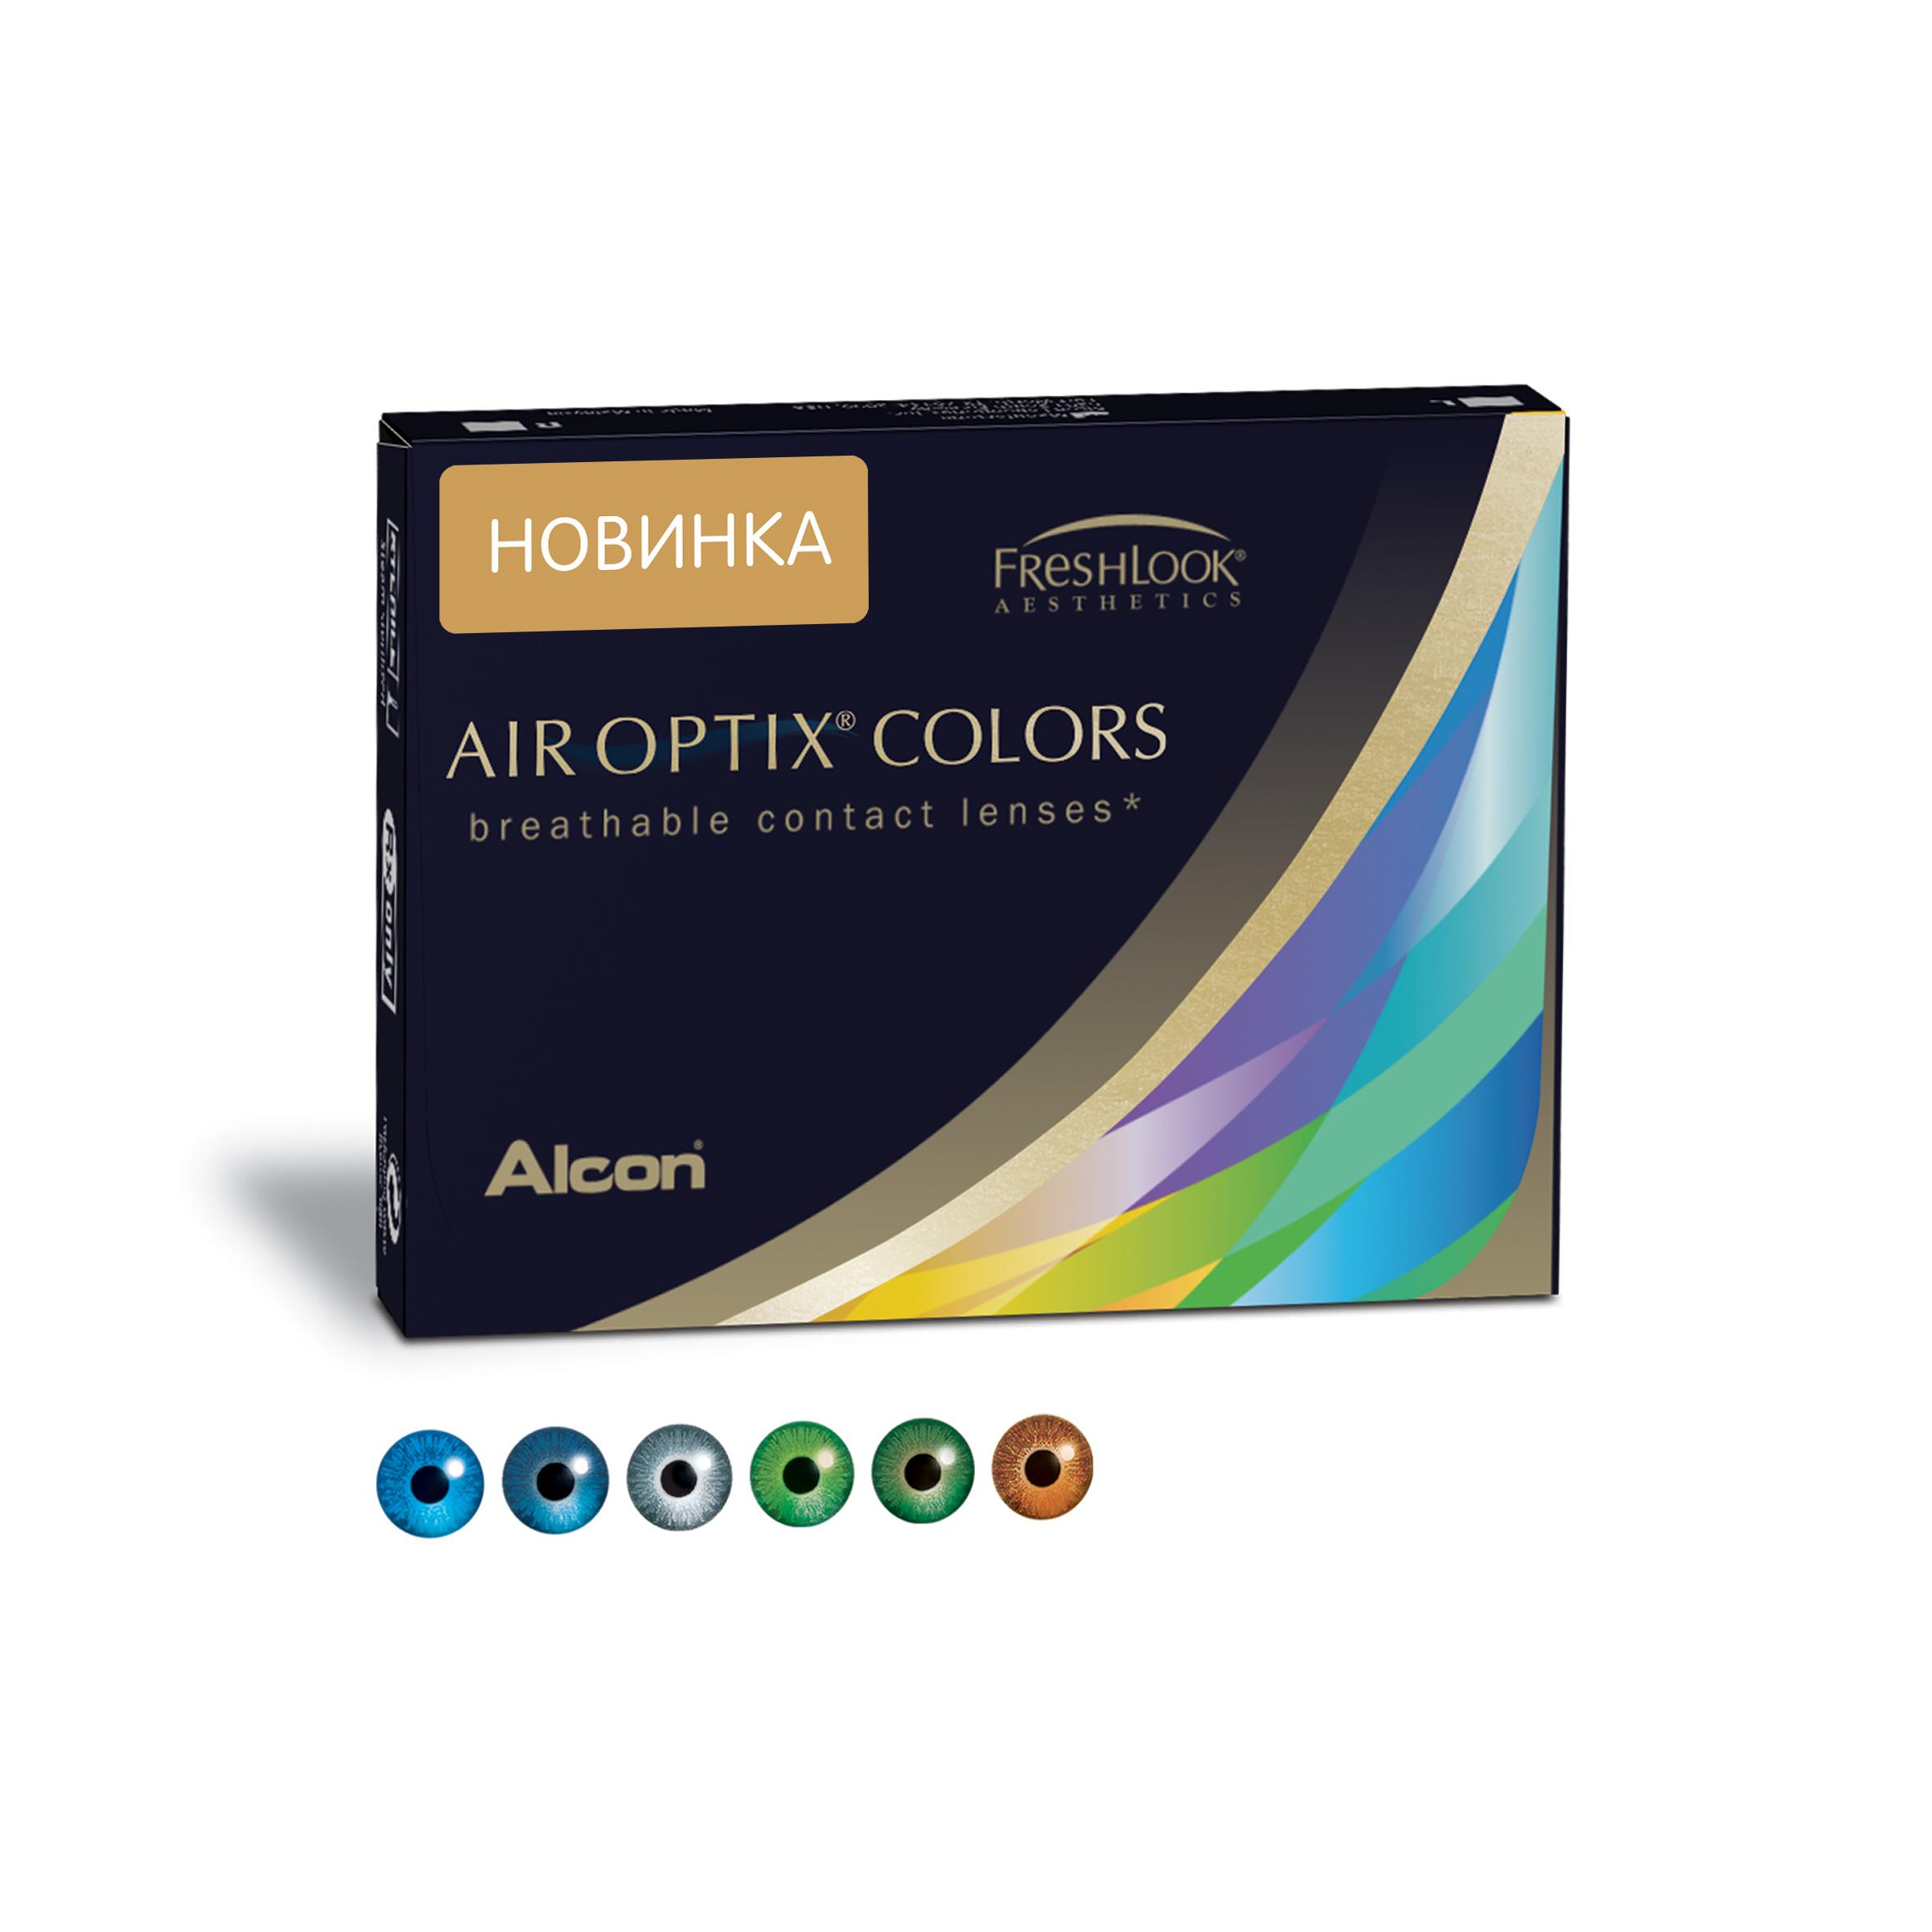 Аlcon контактные линзы Air Optix Colors 2 шт -2.50 Honey